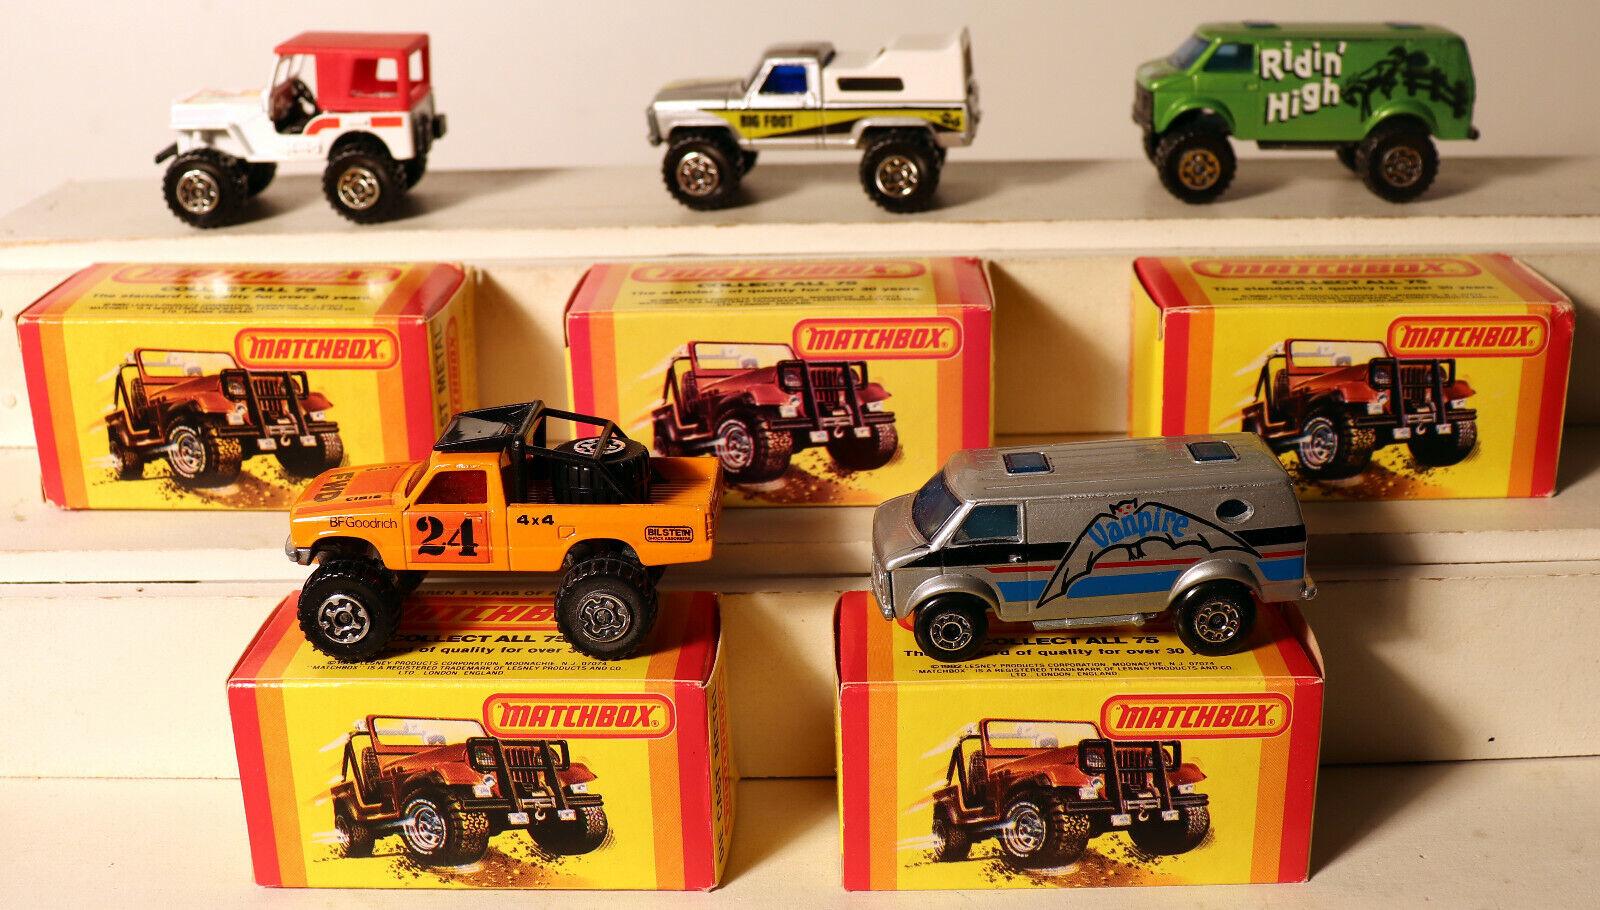 orden en línea DTE 5 Yel Yel Yel Caja Lesney Matchbox súperfast Rojo 20 22 44, 57, 68 camión van vanpire  preferente